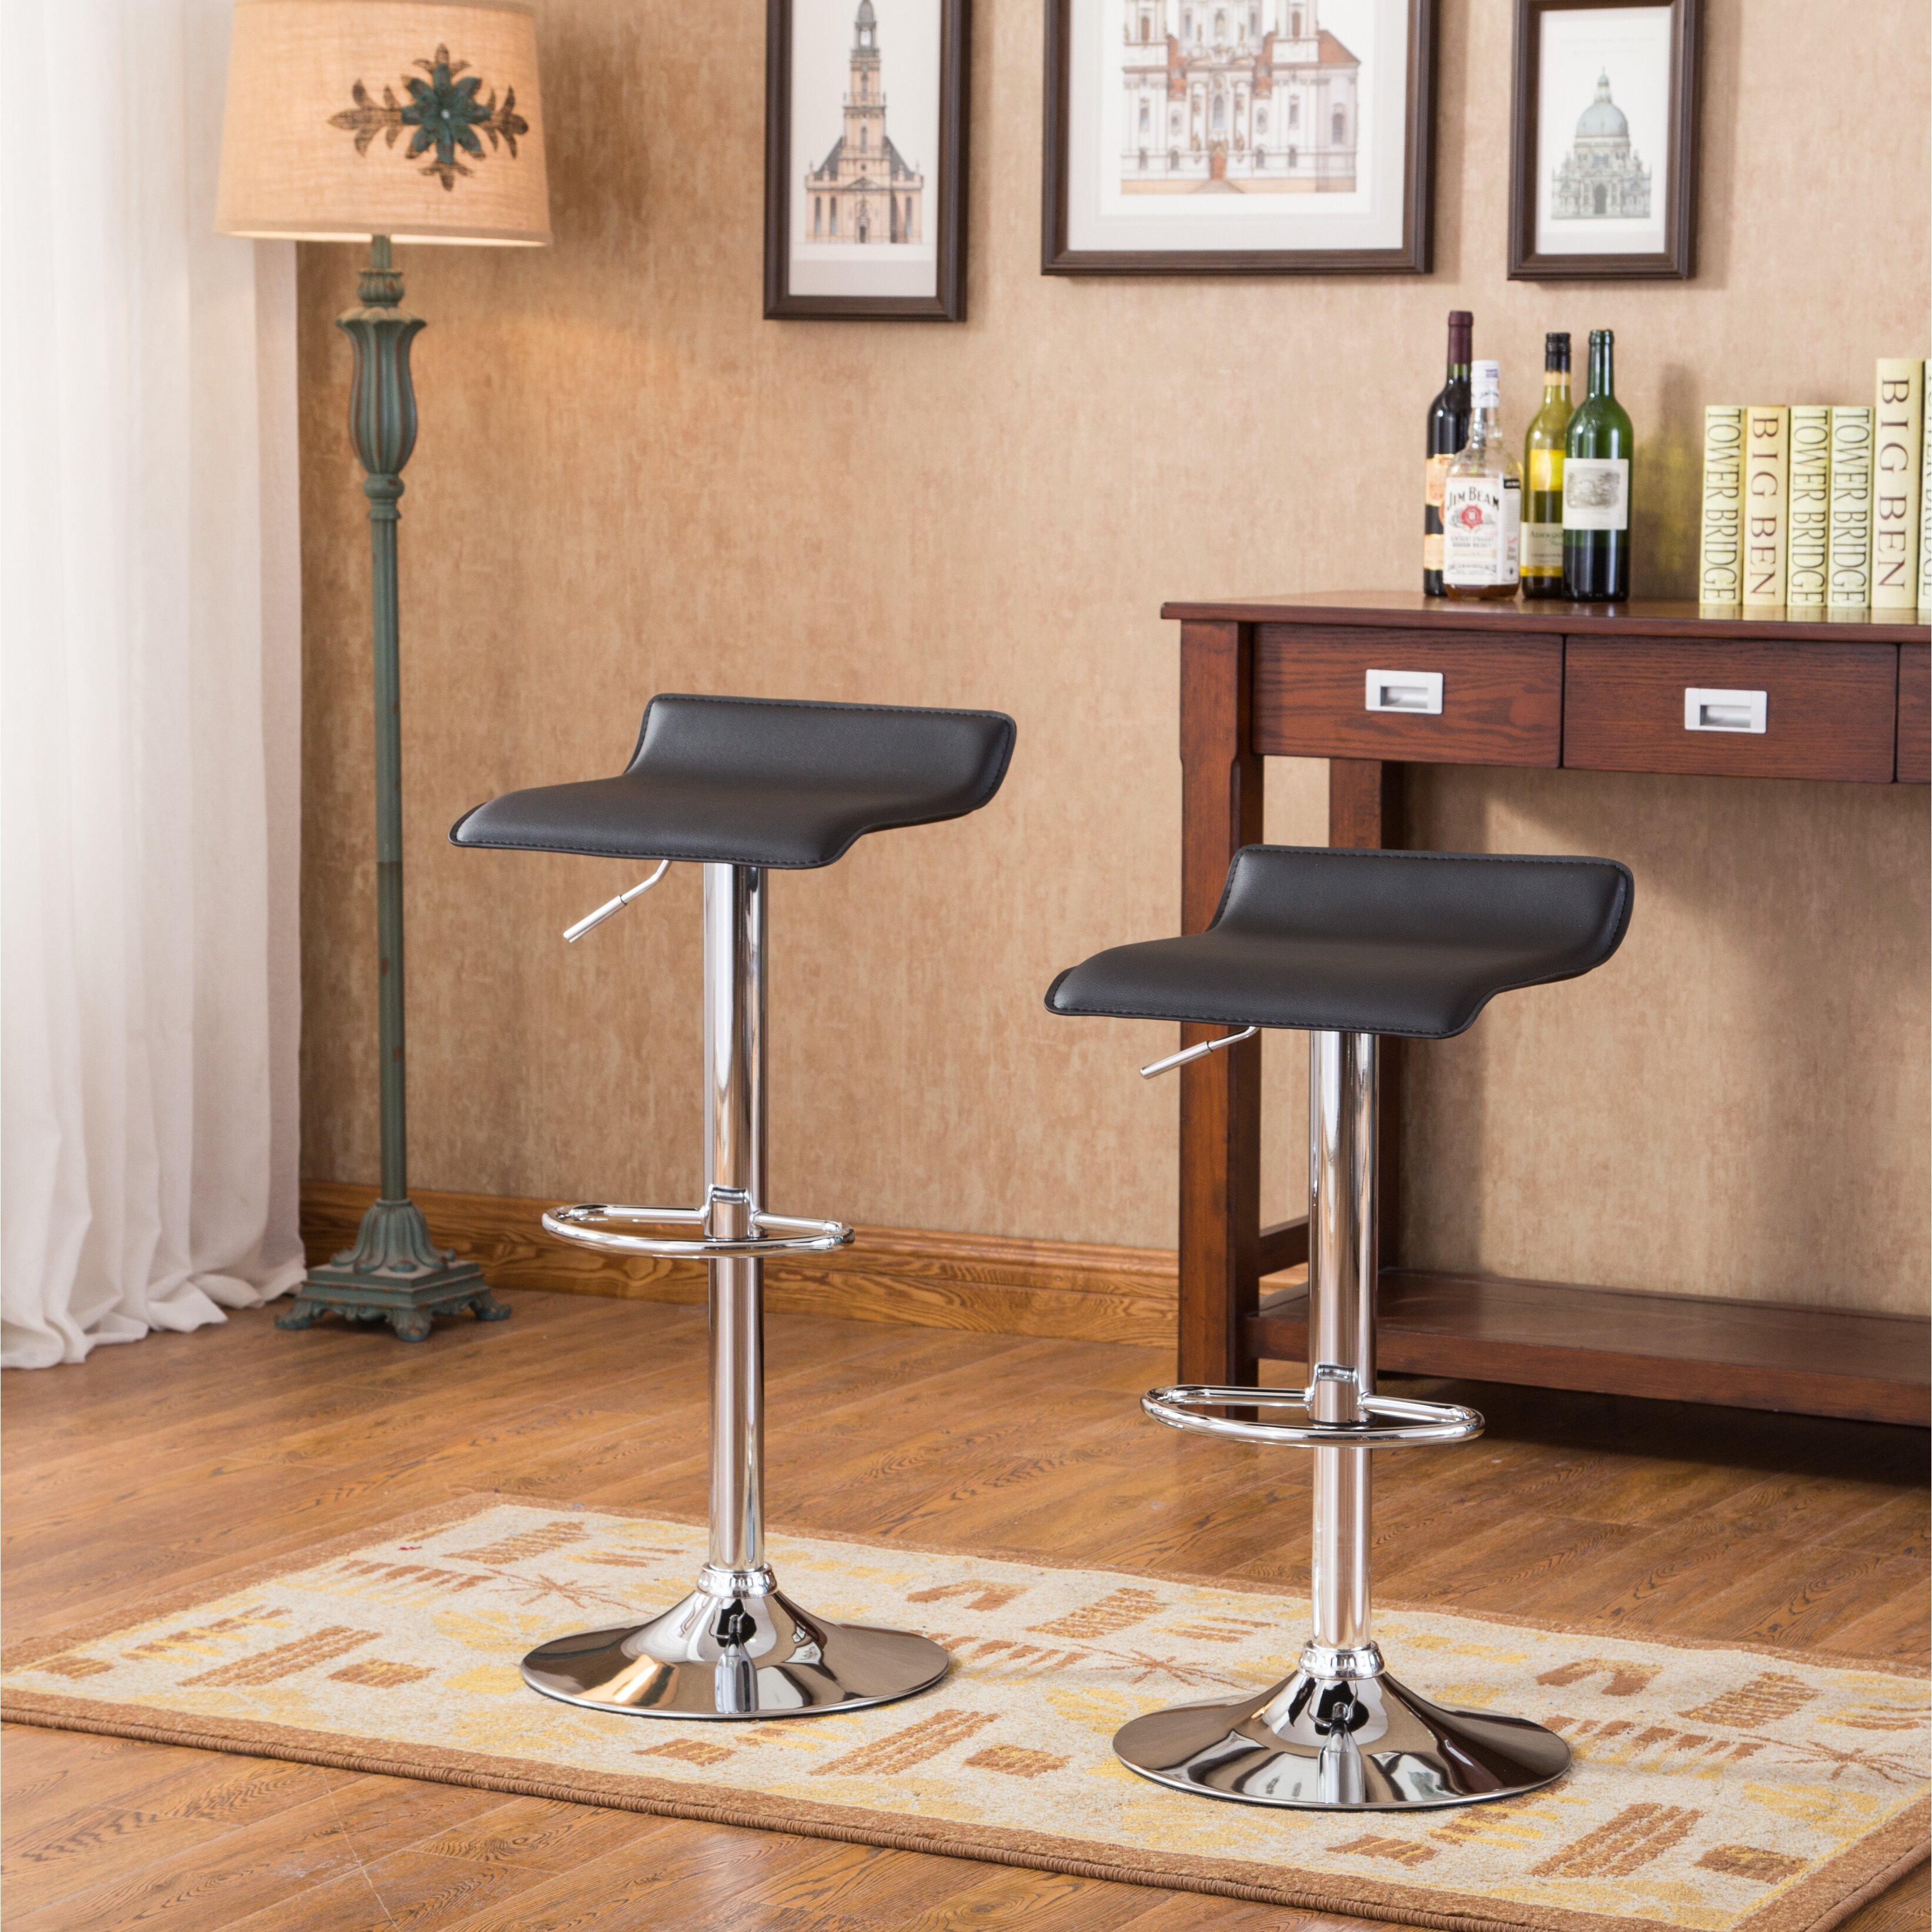 Enjoyable Roundhill Furniture Bar Stools 51 Off Roundhill Furniture Theyellowbook Wood Chair Design Ideas Theyellowbookinfo